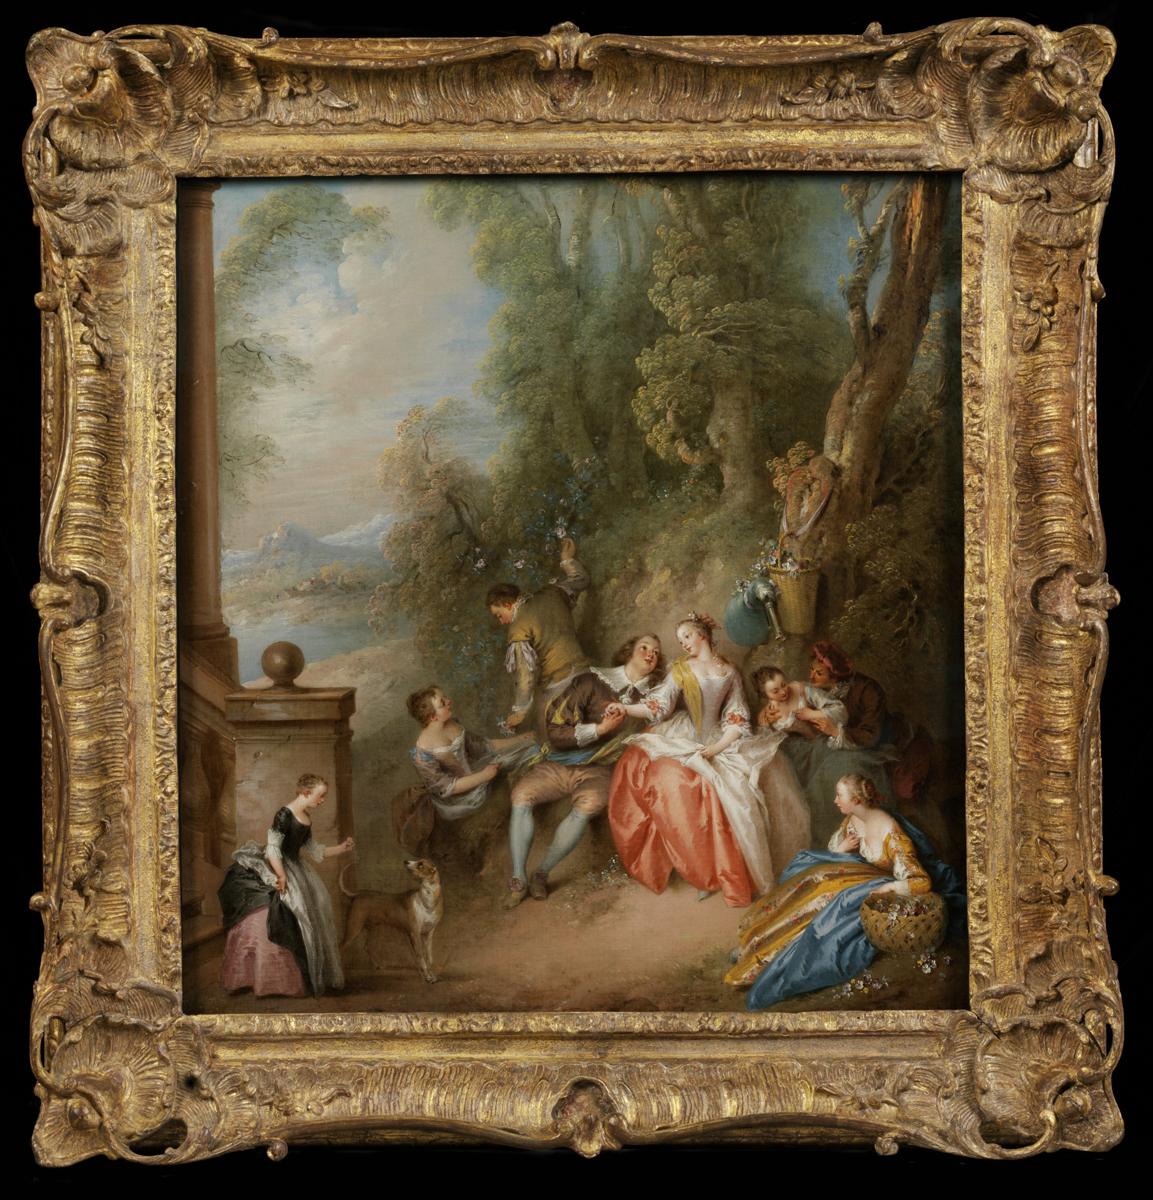 jean baptiste pater fte champtre 1725 35 oc victoria and albert museum london museum no 543 1882 - Museum Frames